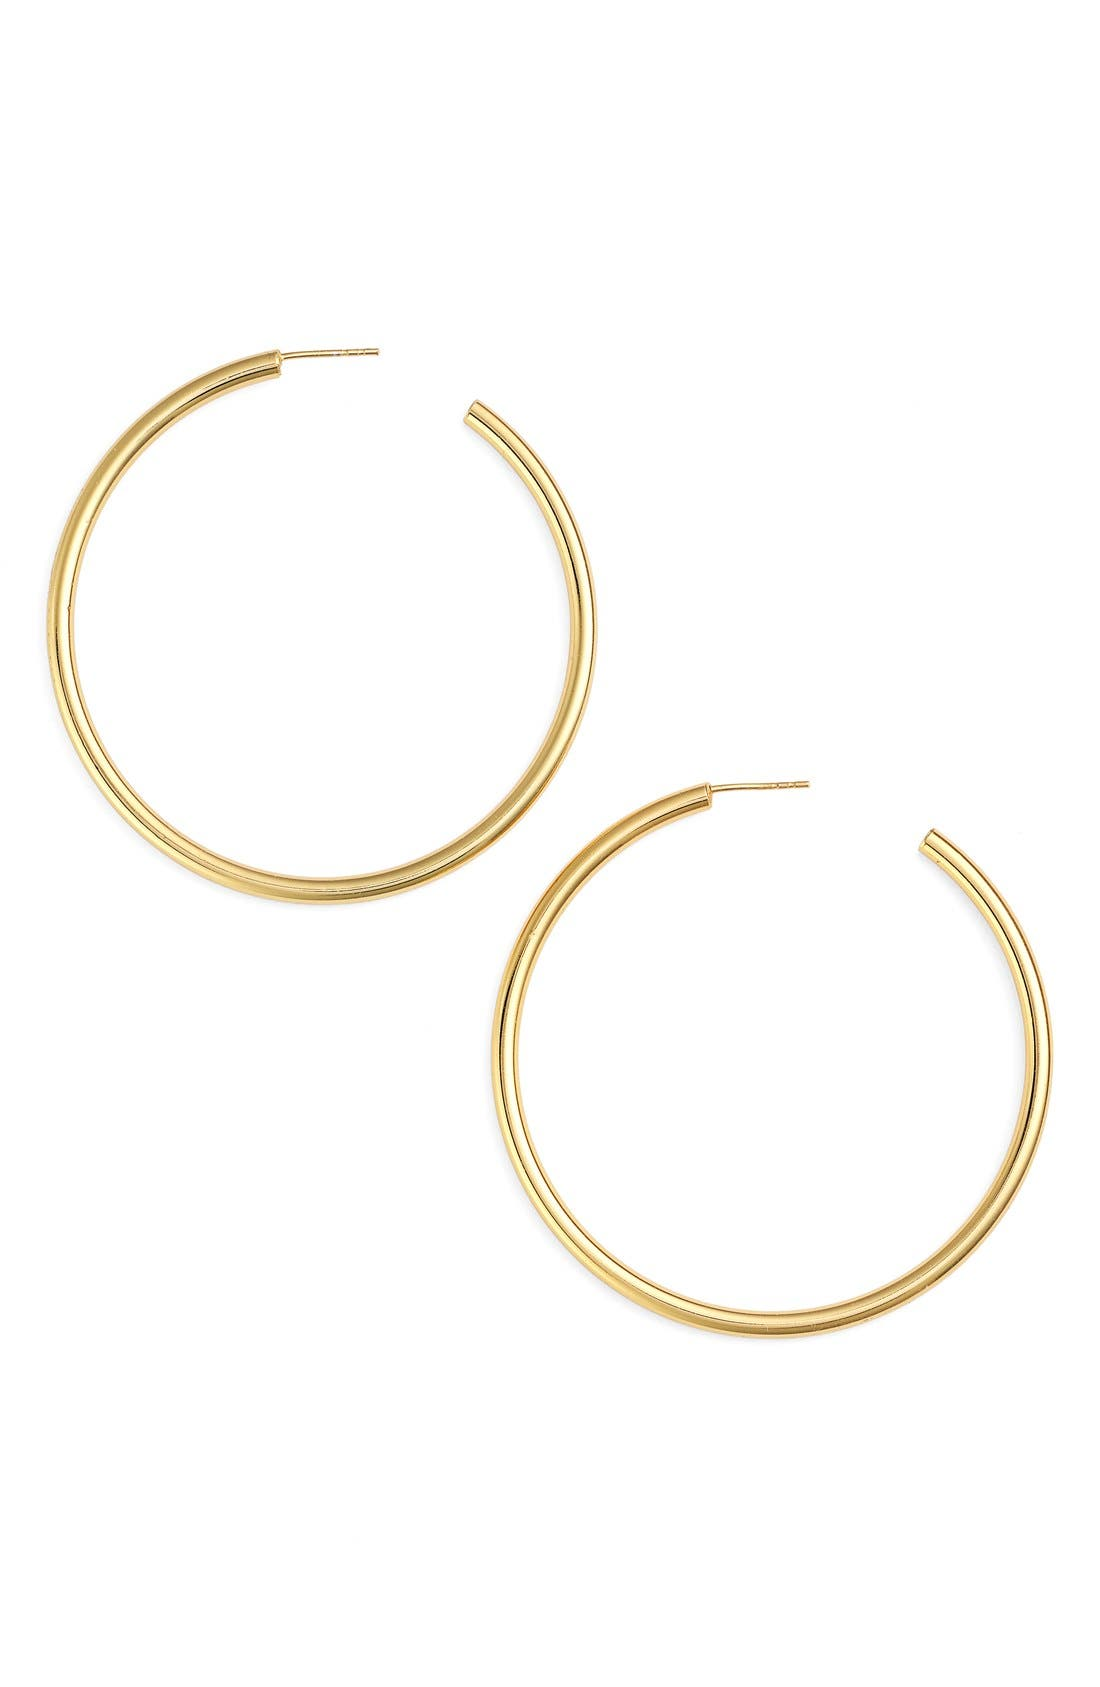 Tubular Hoop Earrings,                         Main,                         color, GOLD